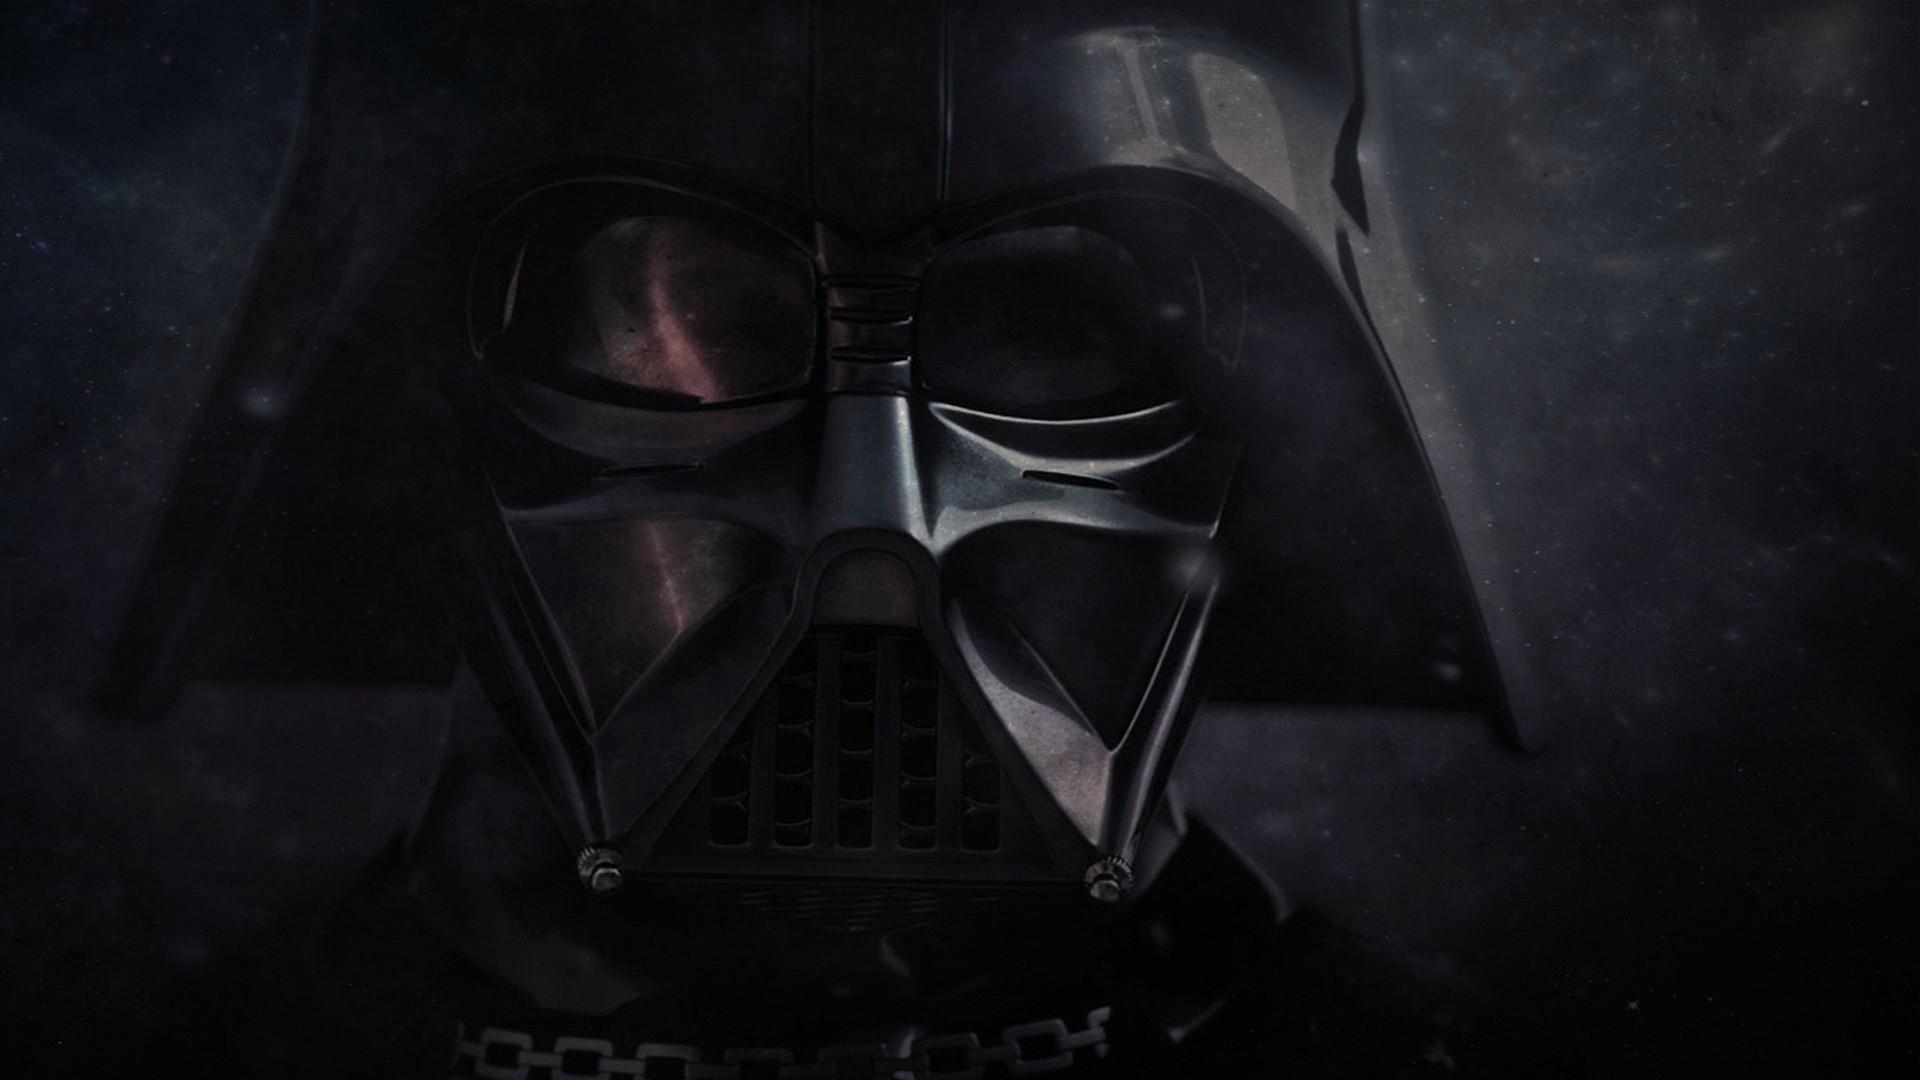 Wallpaper Black Star Wars Darth Vader Midnight Darkness 1920x1080 Px Computer Wallpaper Gas Mask Personal Protective Equipment 1920x1080 Wallhaven 784698 Hd Wallpapers Wallhere